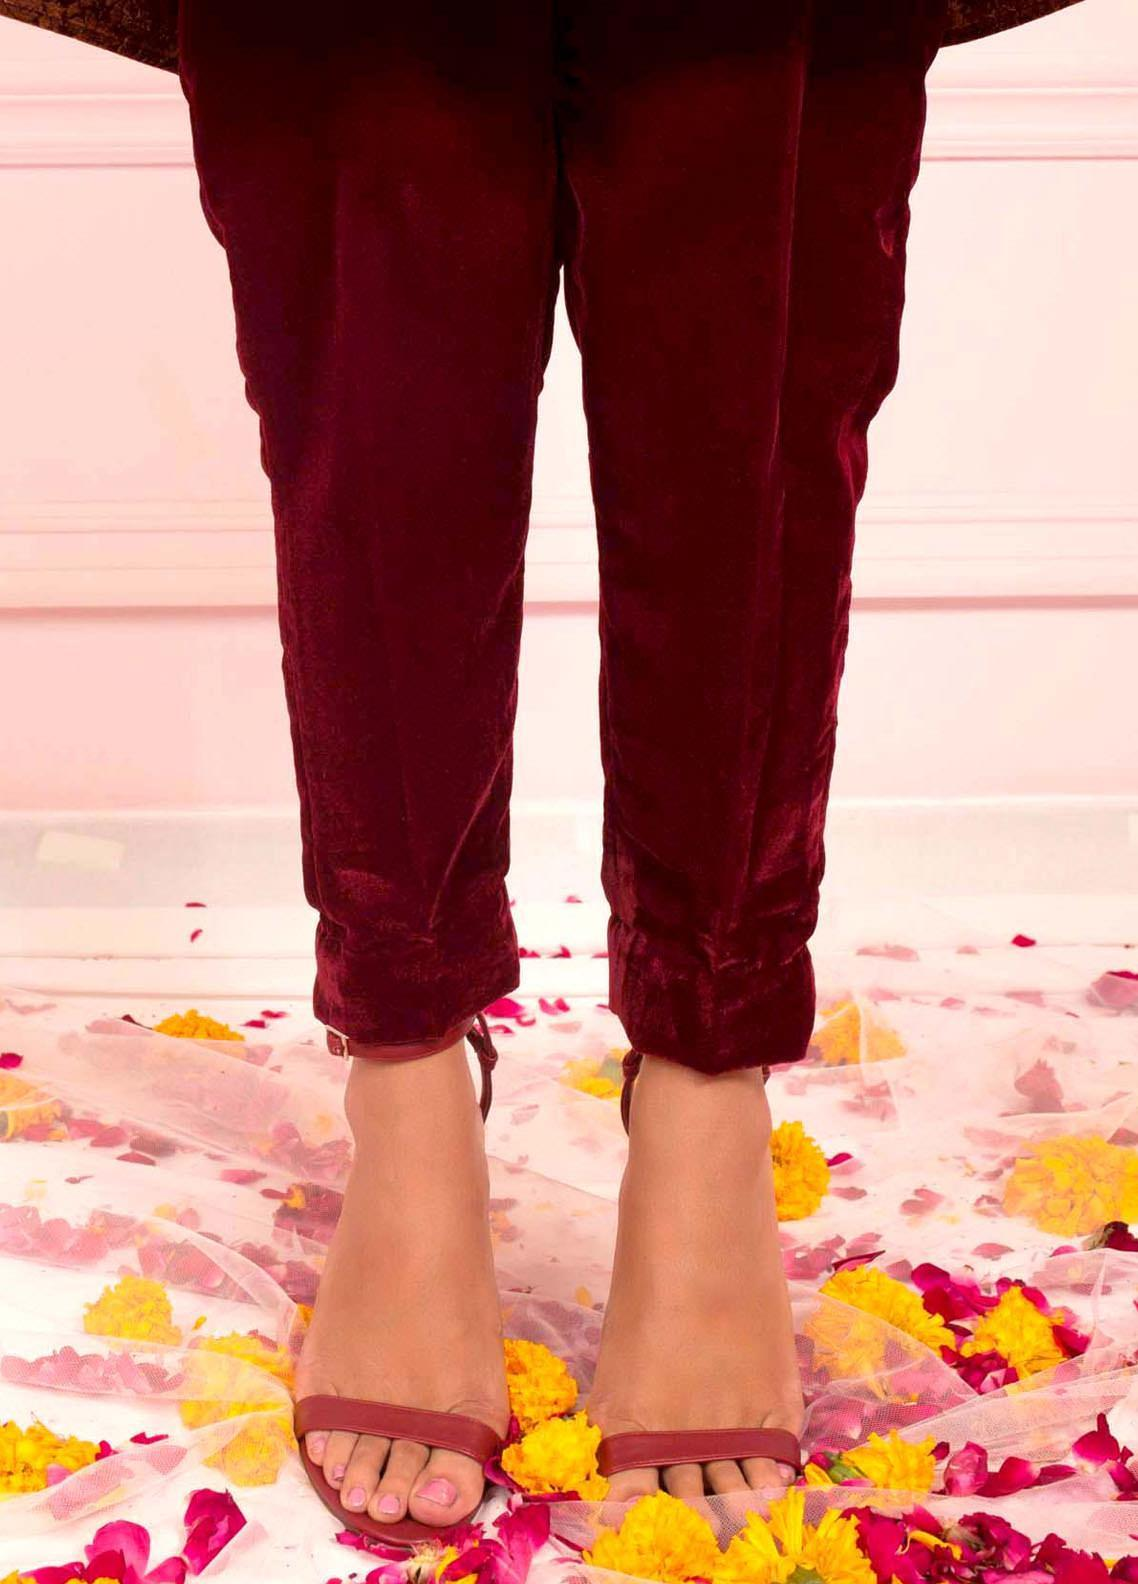 Zaaviay Fancy Velvet Stitched Trousers ZSC-036 MAROON VELVET TROUSER